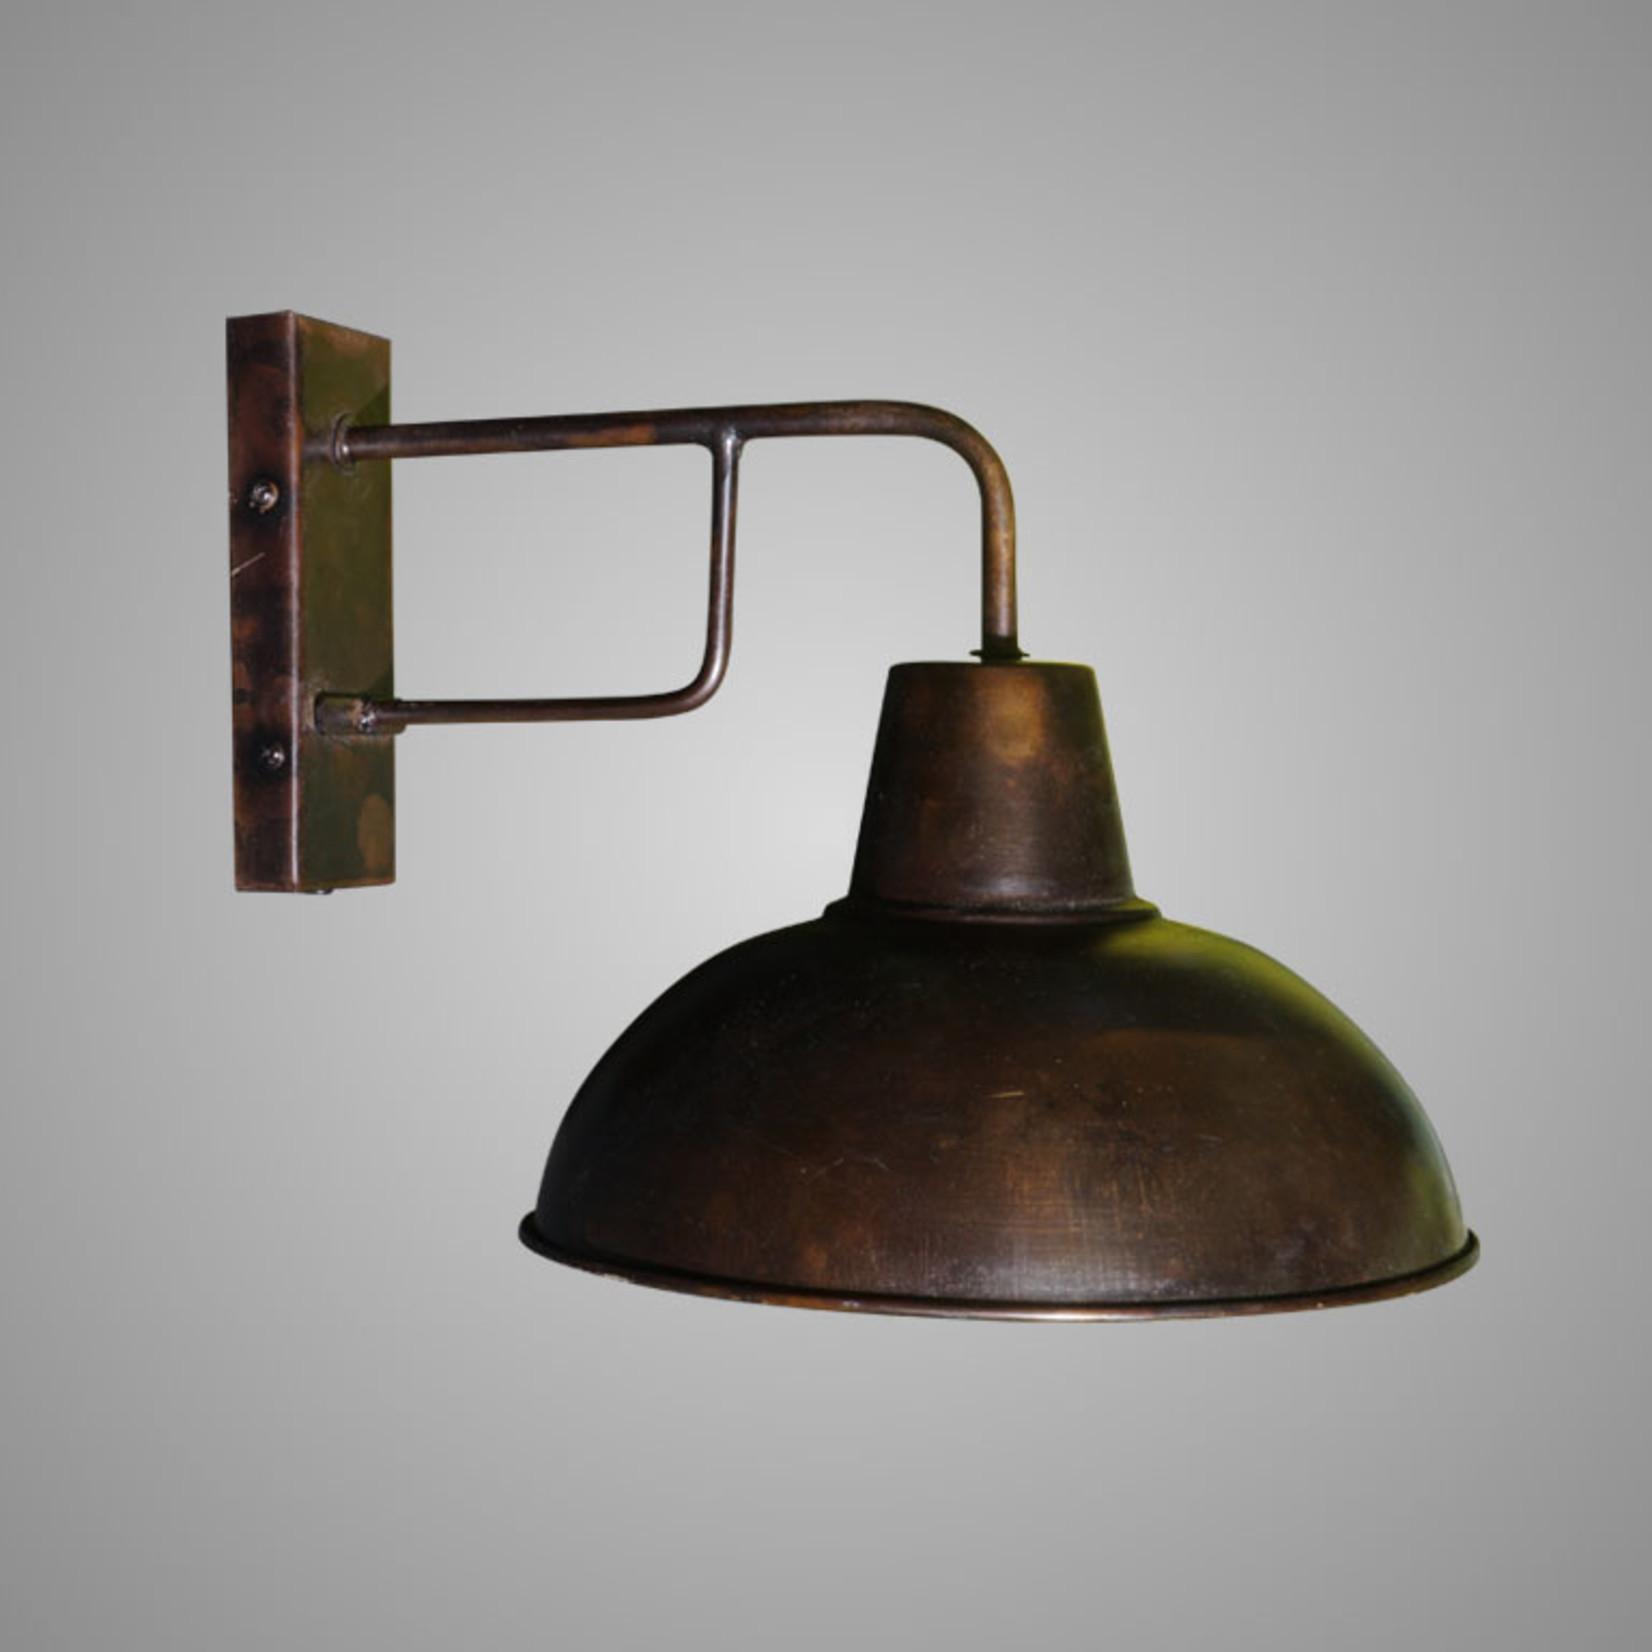 Brynxz Brynxz Lamp Wall Classico Antic Brown